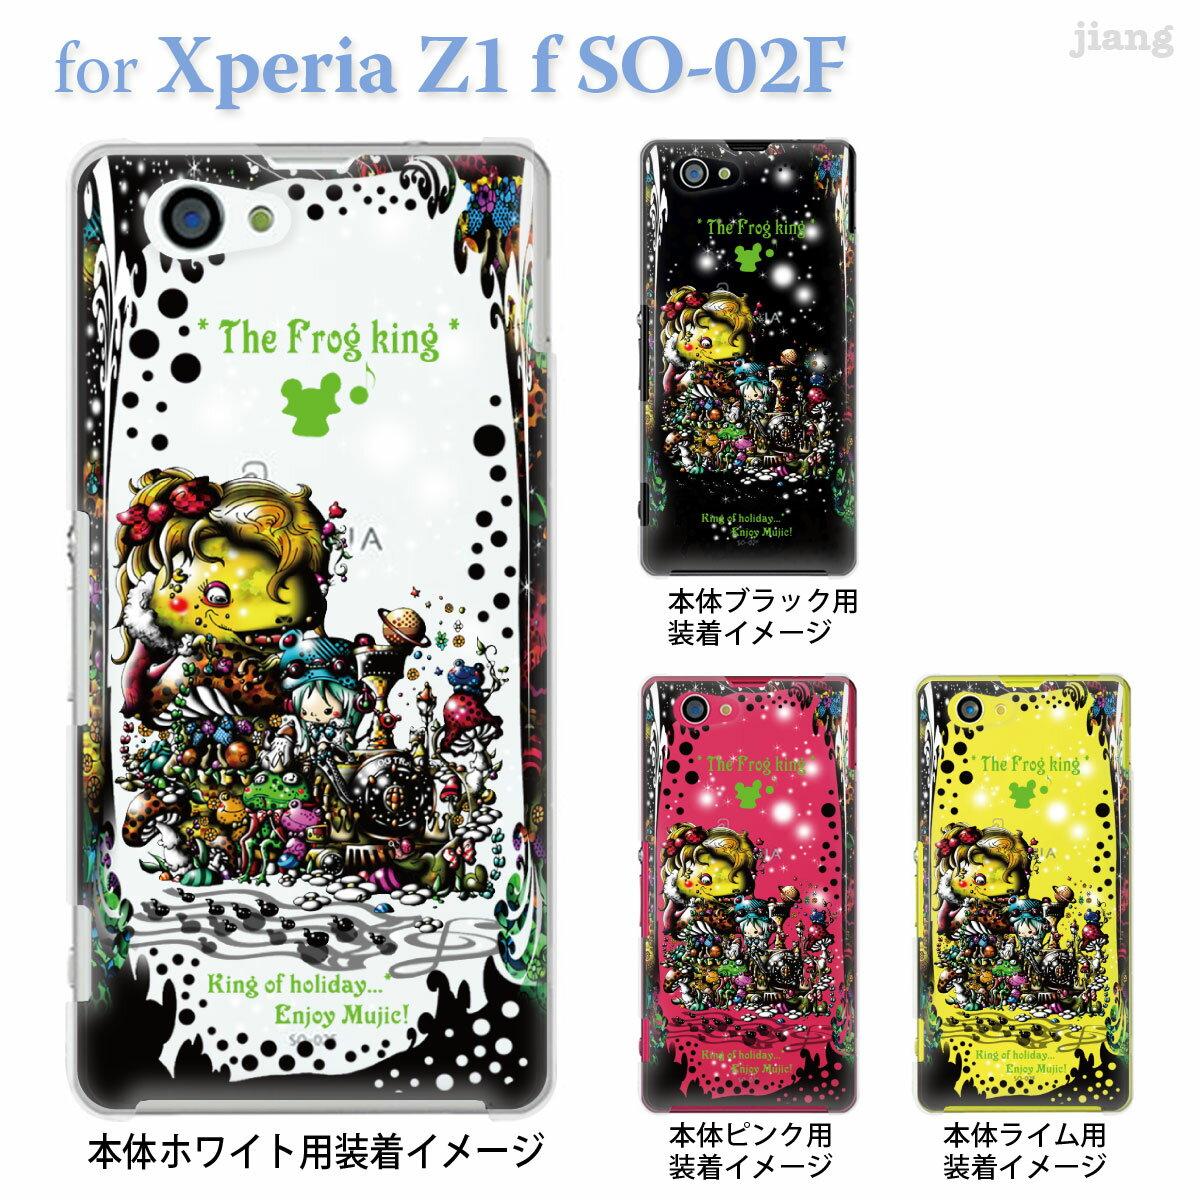 【Xperia Z1 f SO-02F 】【SO-02F ケース】【カバー】【スマホケース】【スマホカバー】【クリアケース】【イラスト】【Little World】【グリム童話】【かえるの王様】 25-so02f-am0095